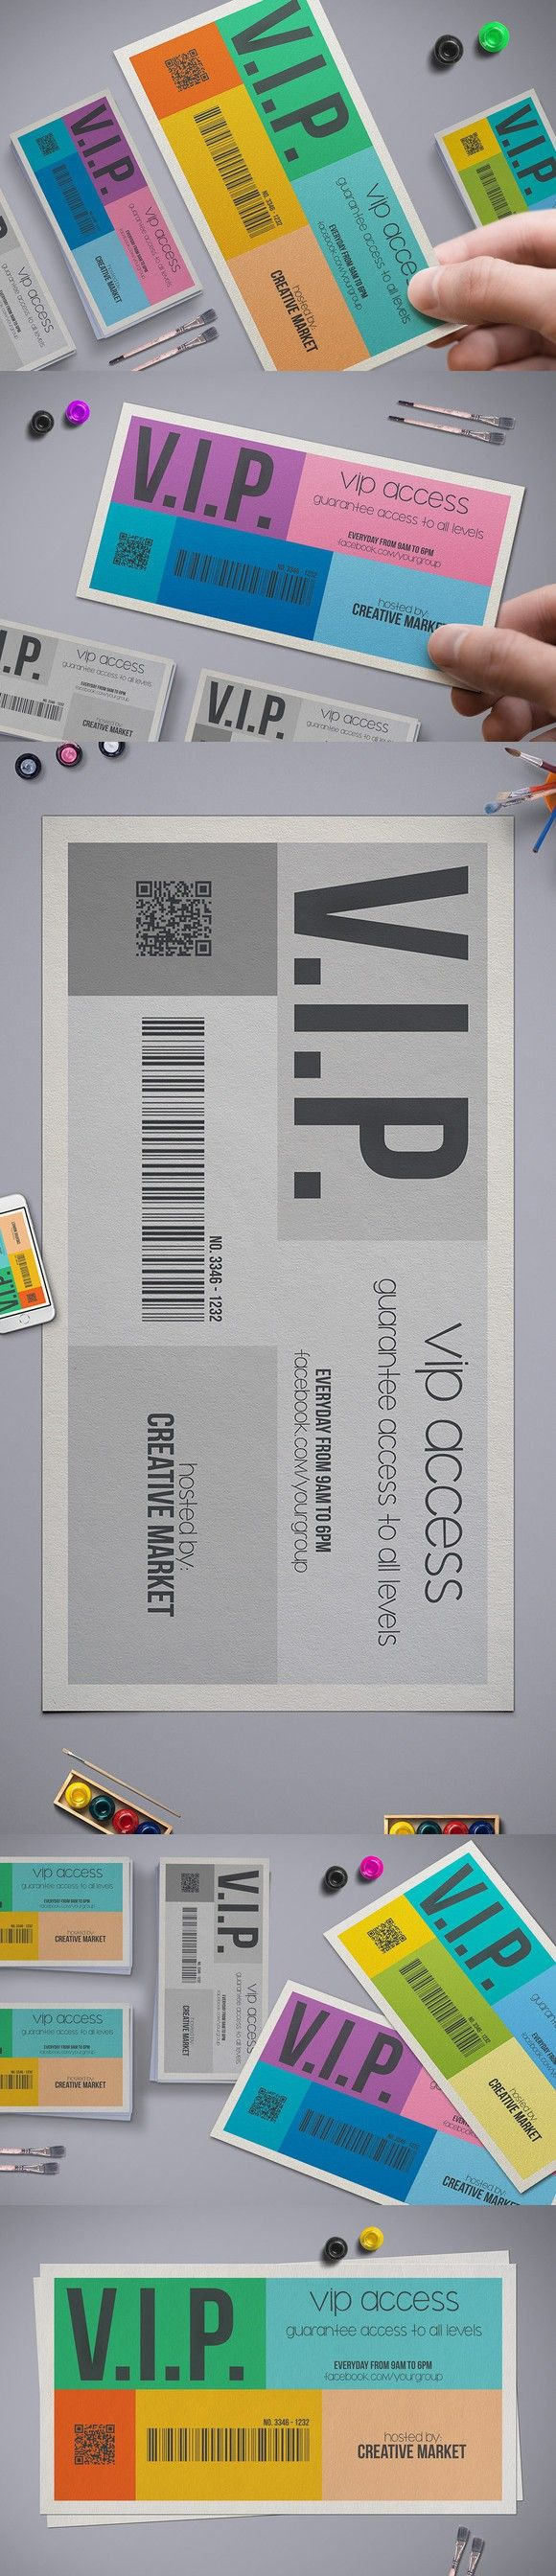 Metro Style Vip Pass Template. Creative Card Templates. $7.00